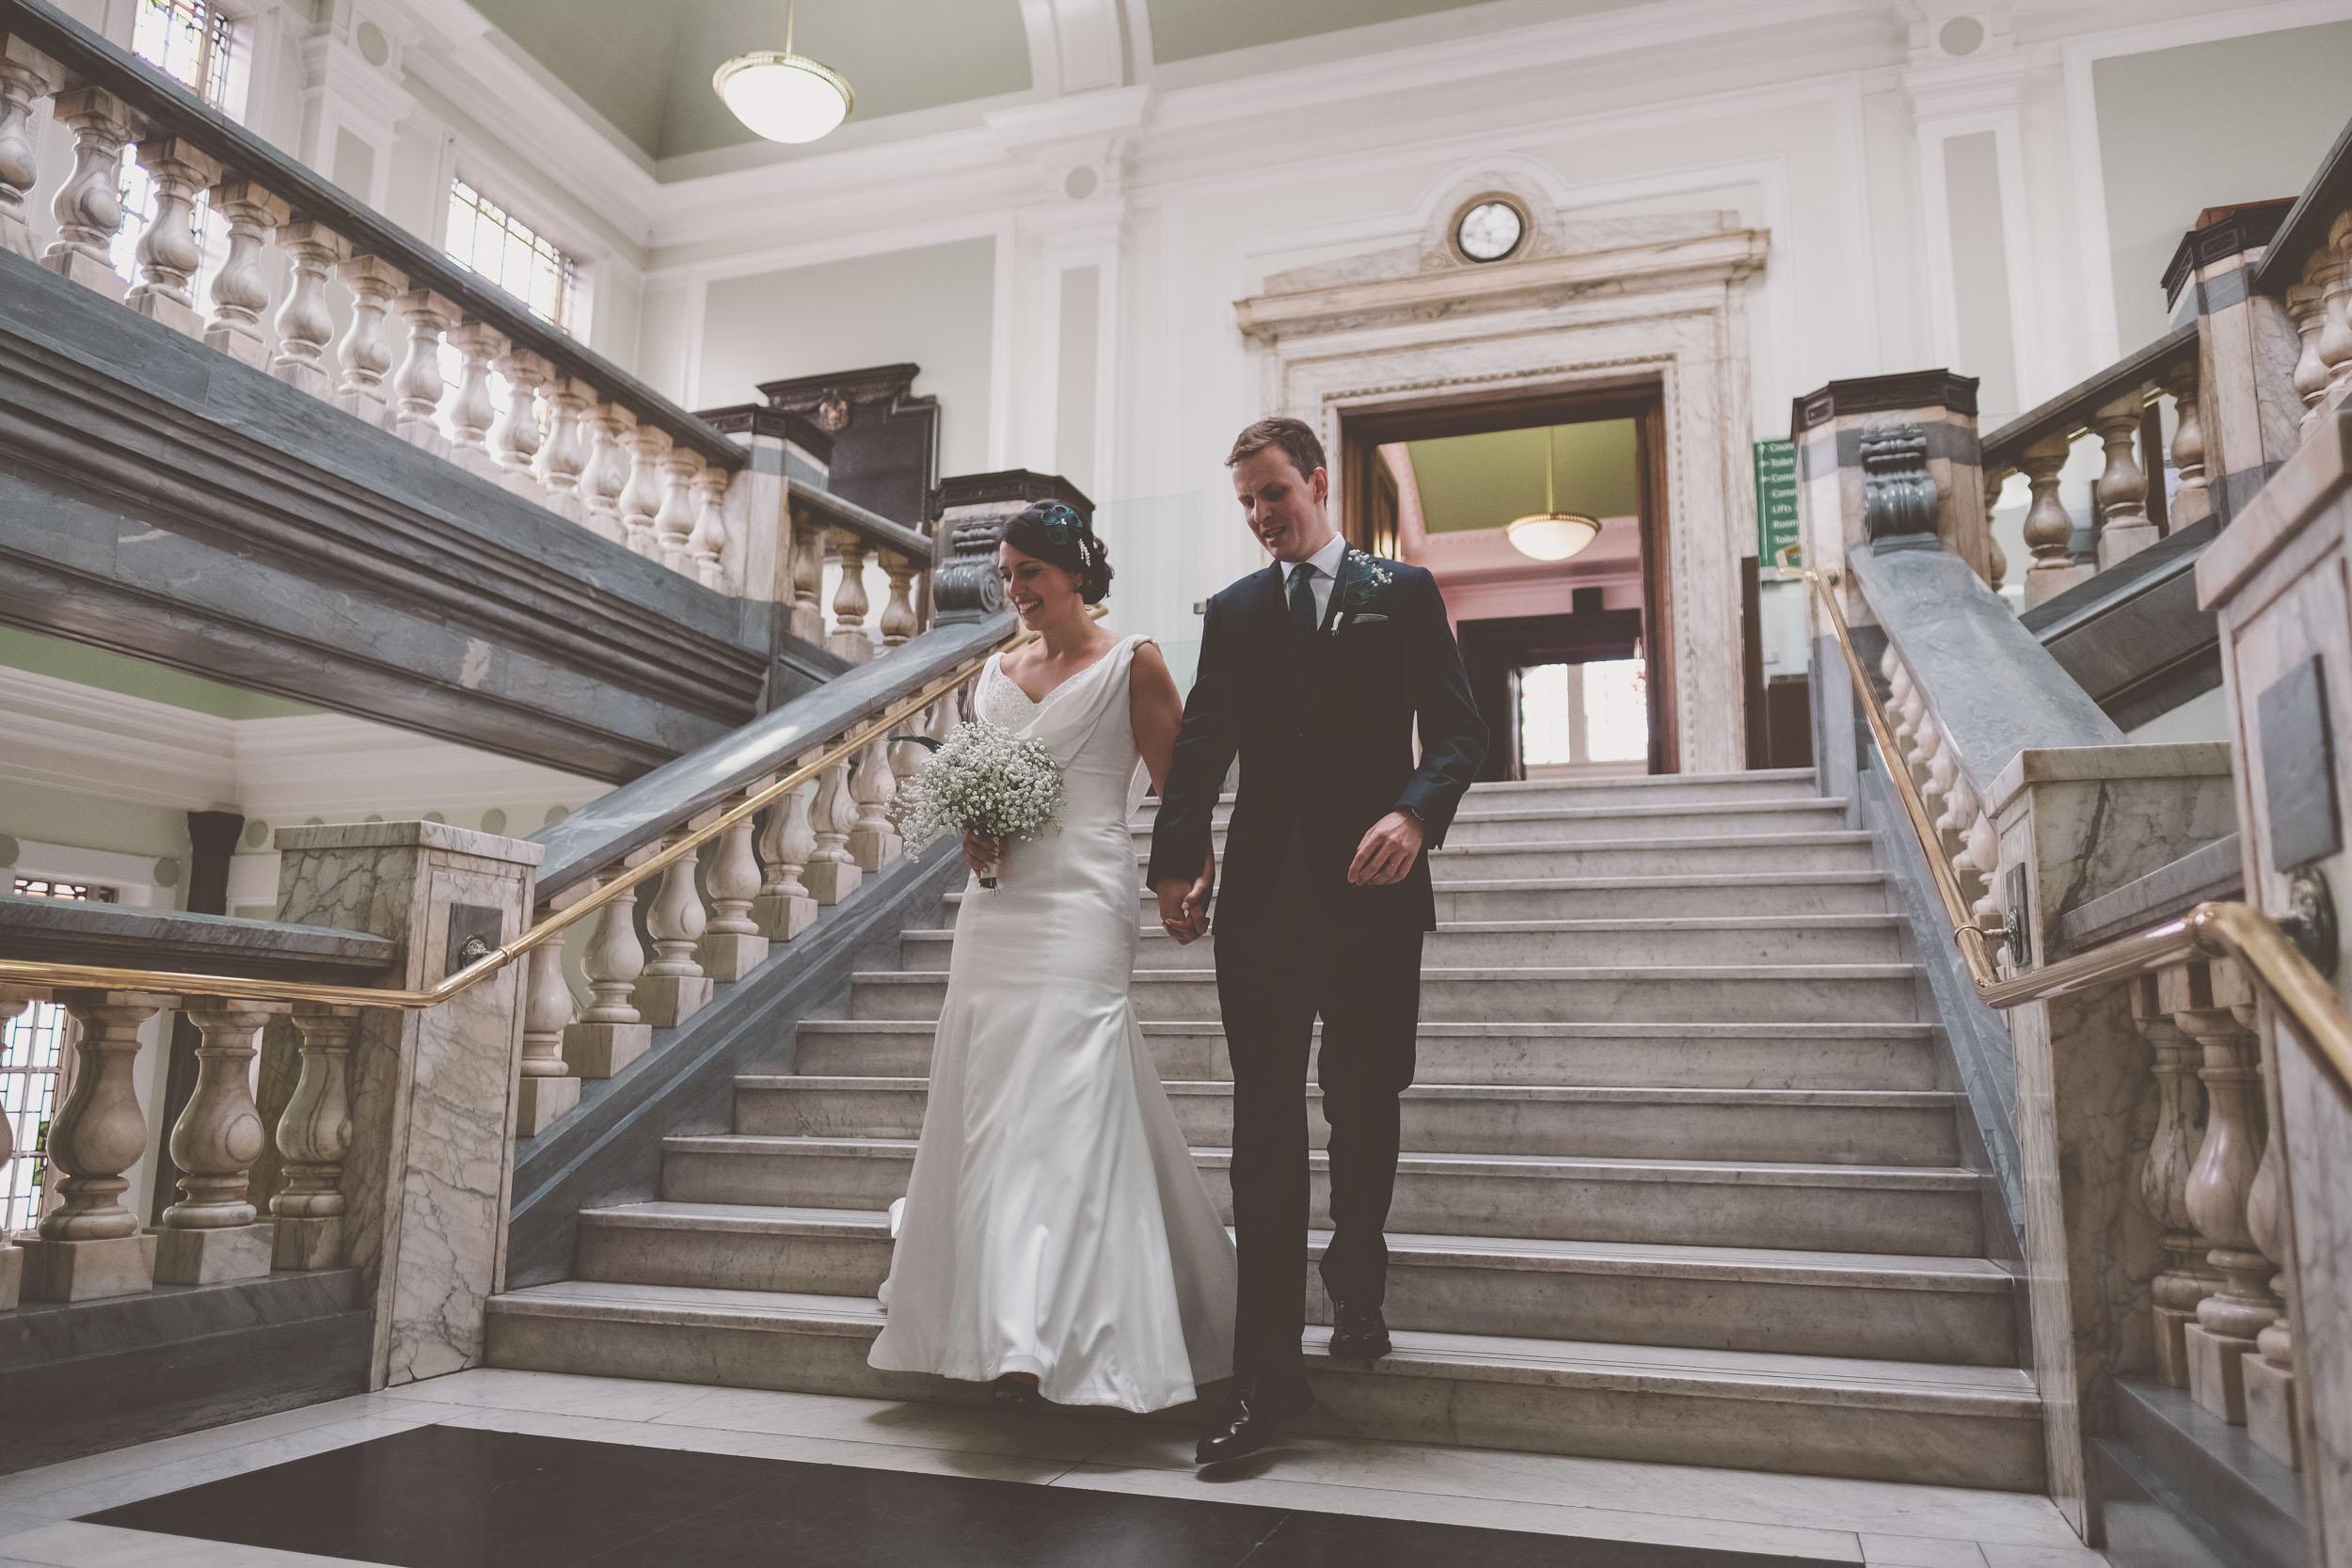 islington-town-hall-4th-floor-studios-wedding140.jpg